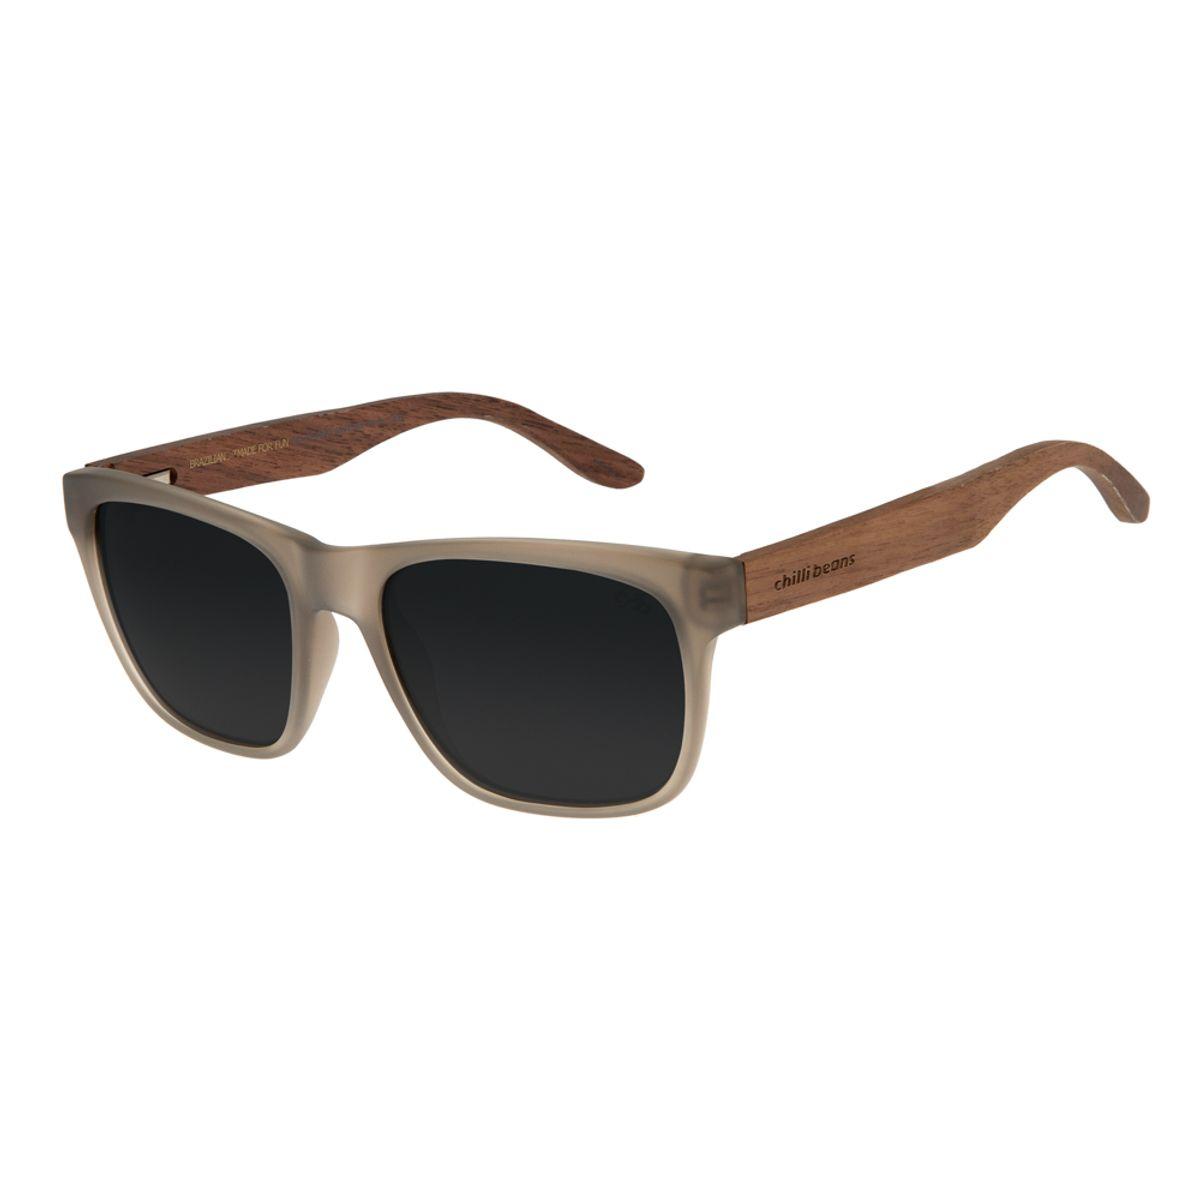 c3865b70e Óculos de Sol Chilli Beans Masculino Haste de Madeira Cinza ...